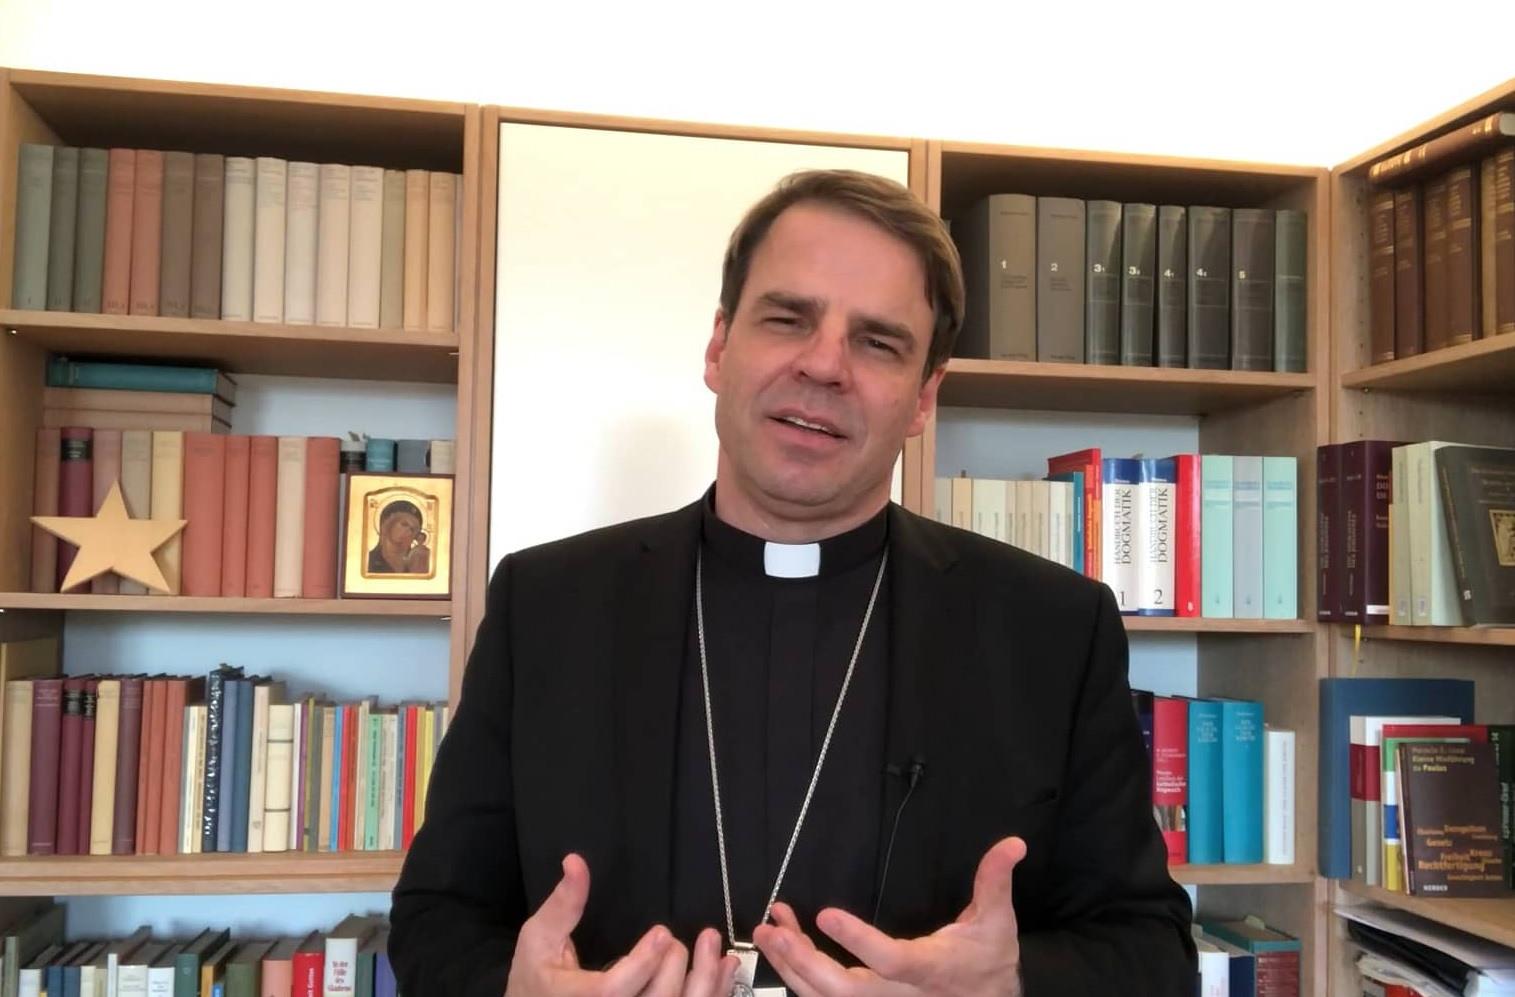 Bischof Oster Video